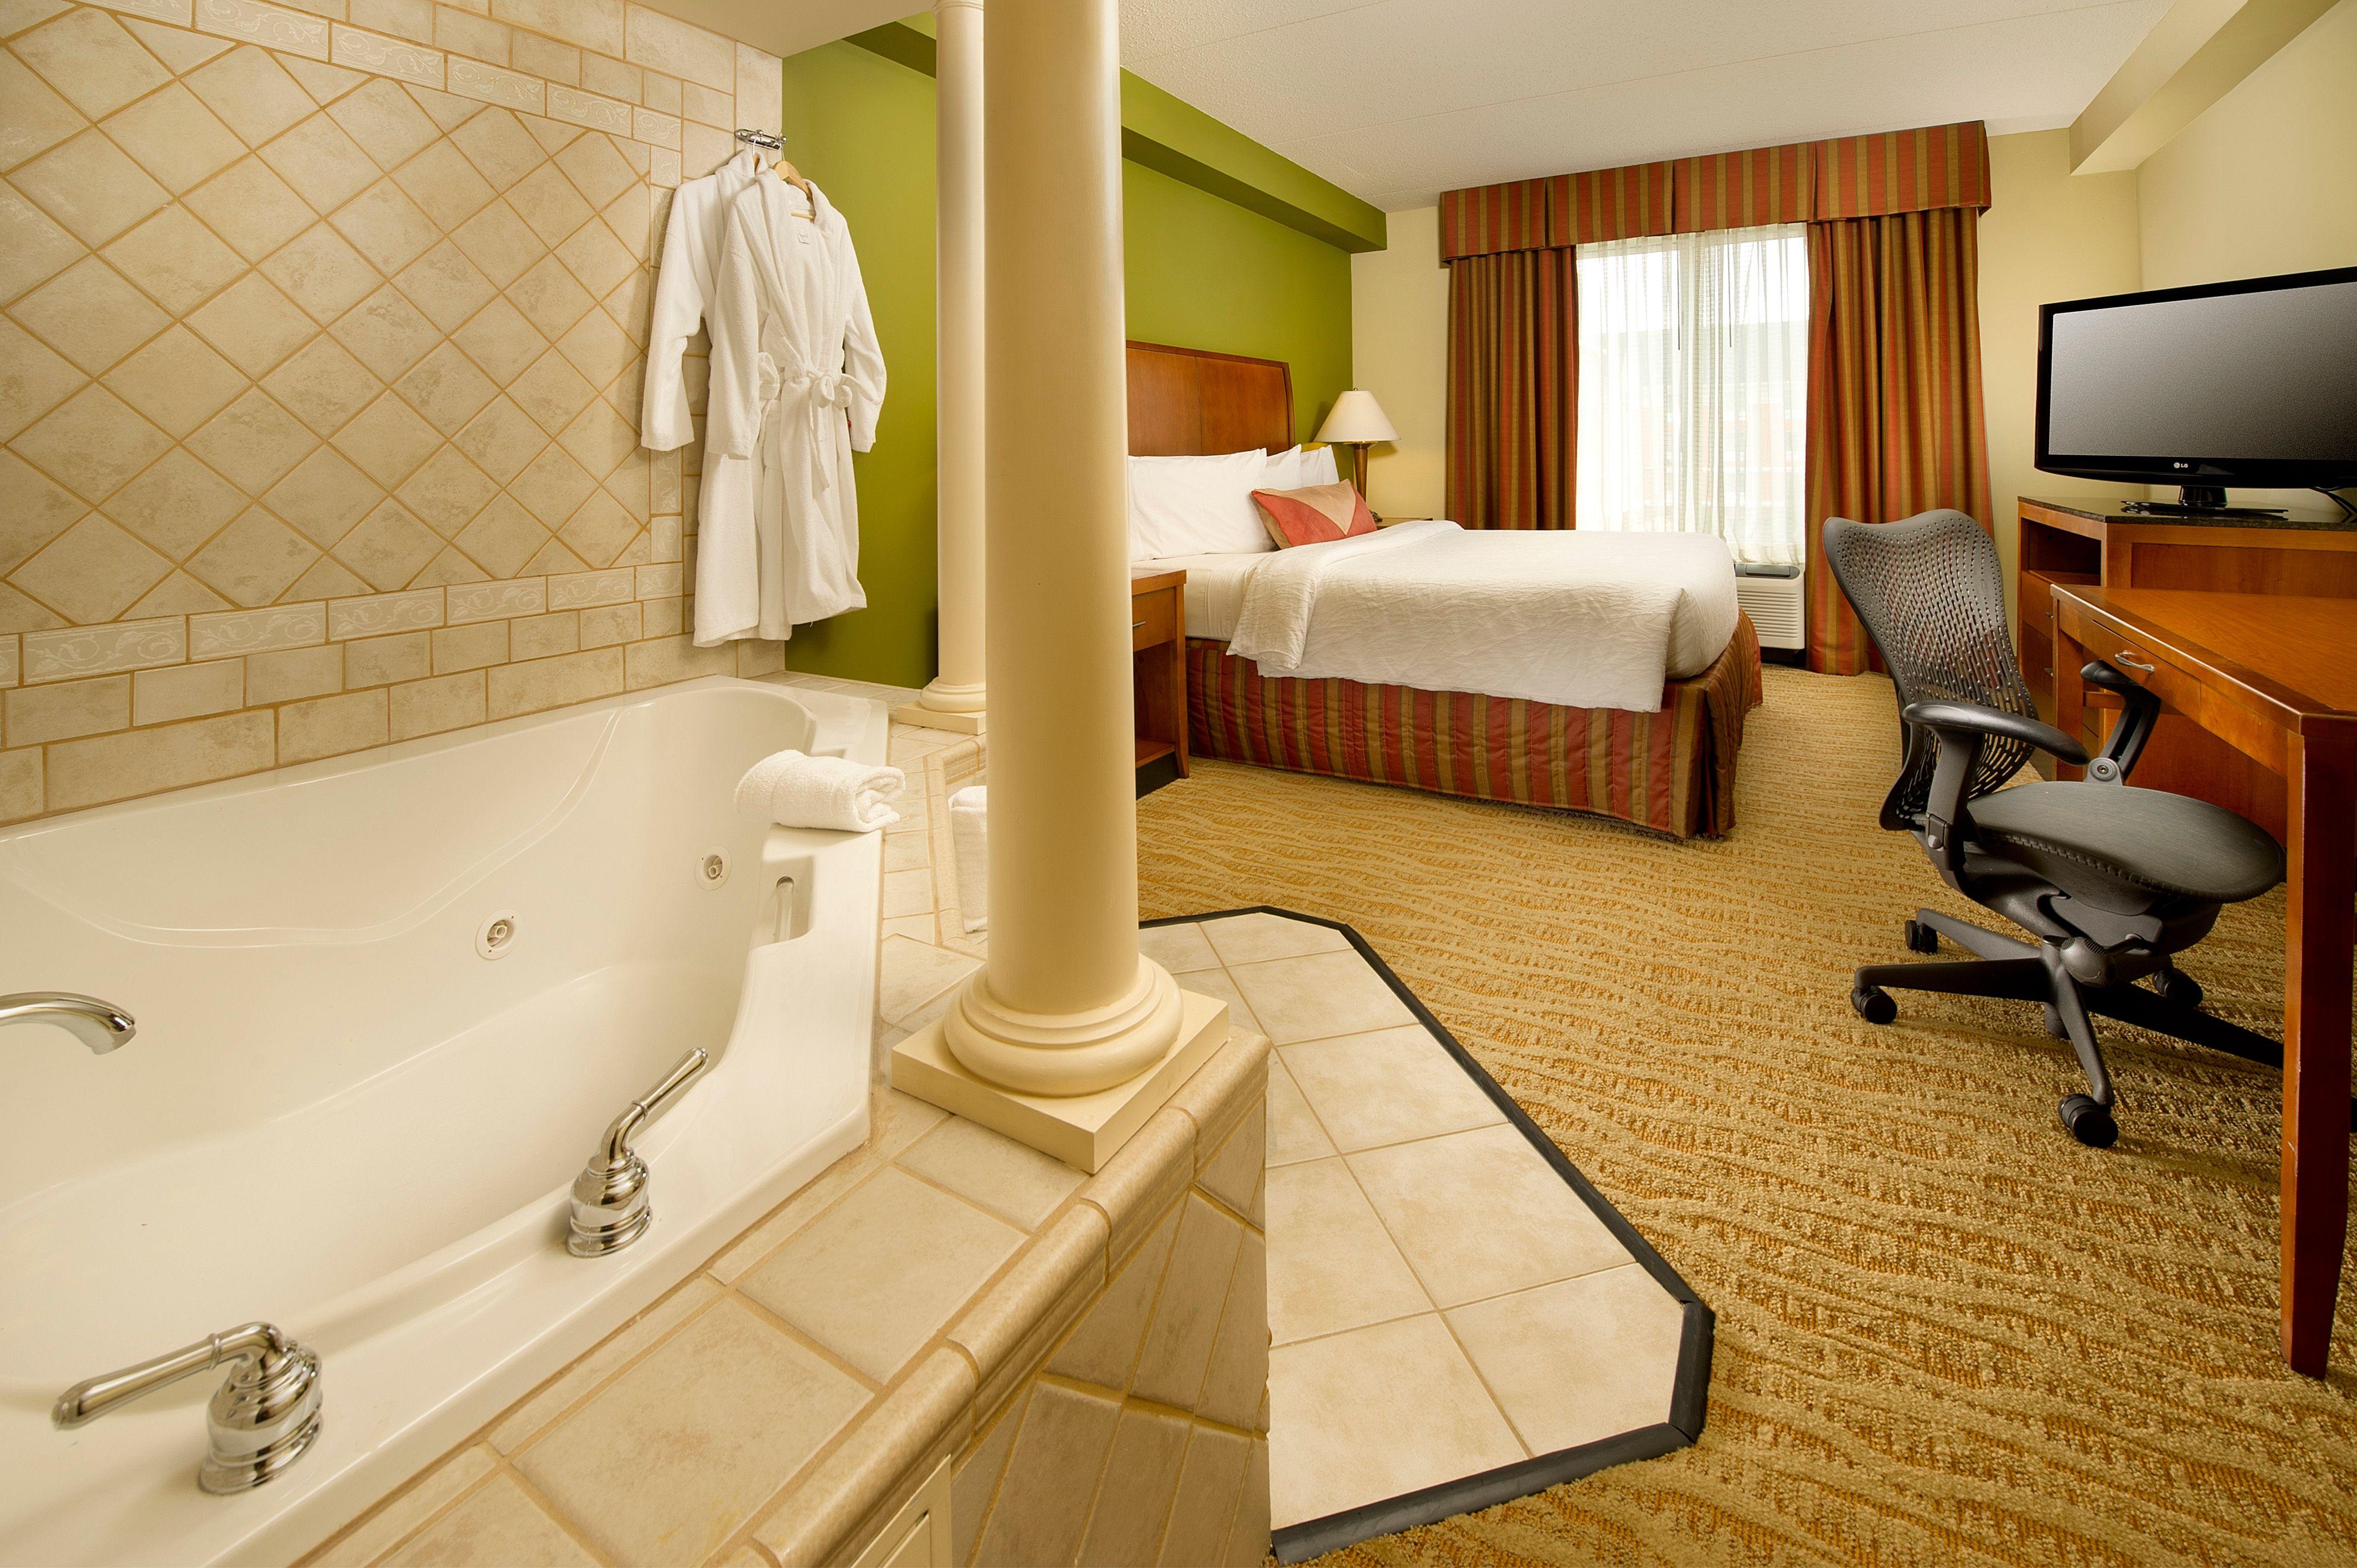 King Whirlpool Guest Room | Rooms & Amenities | Pinterest